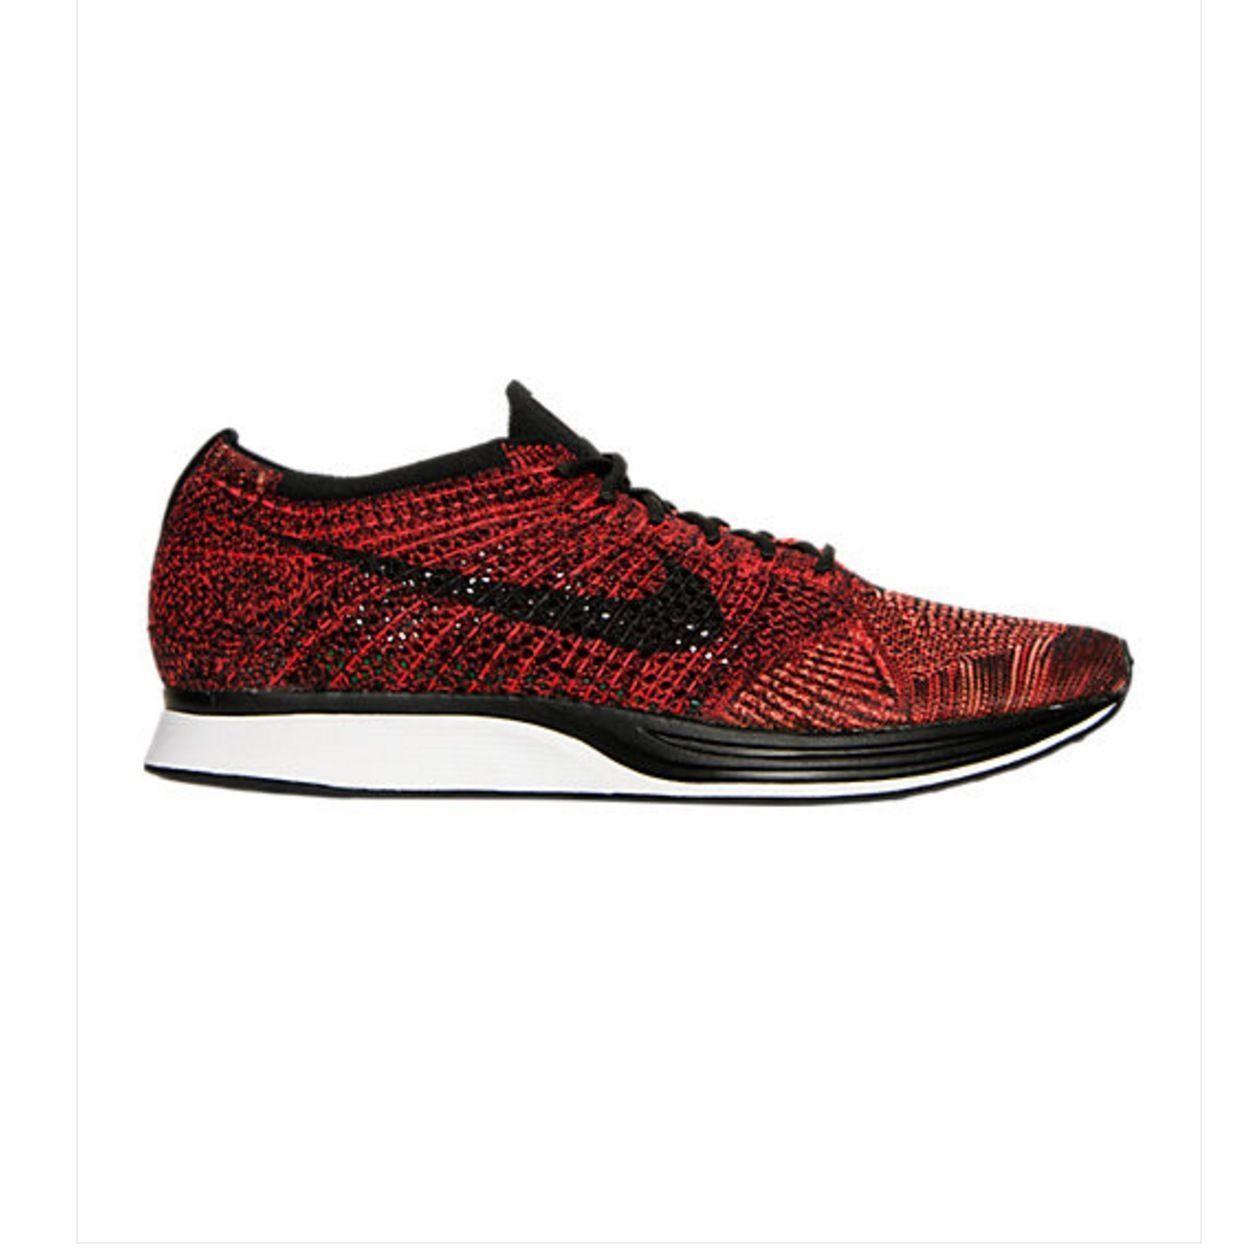 sneakers for cheap 7e47a e525d ... italy nike flyknit racer 526628 608 des chaussures de course rouge noir  526628 608 racer hommes